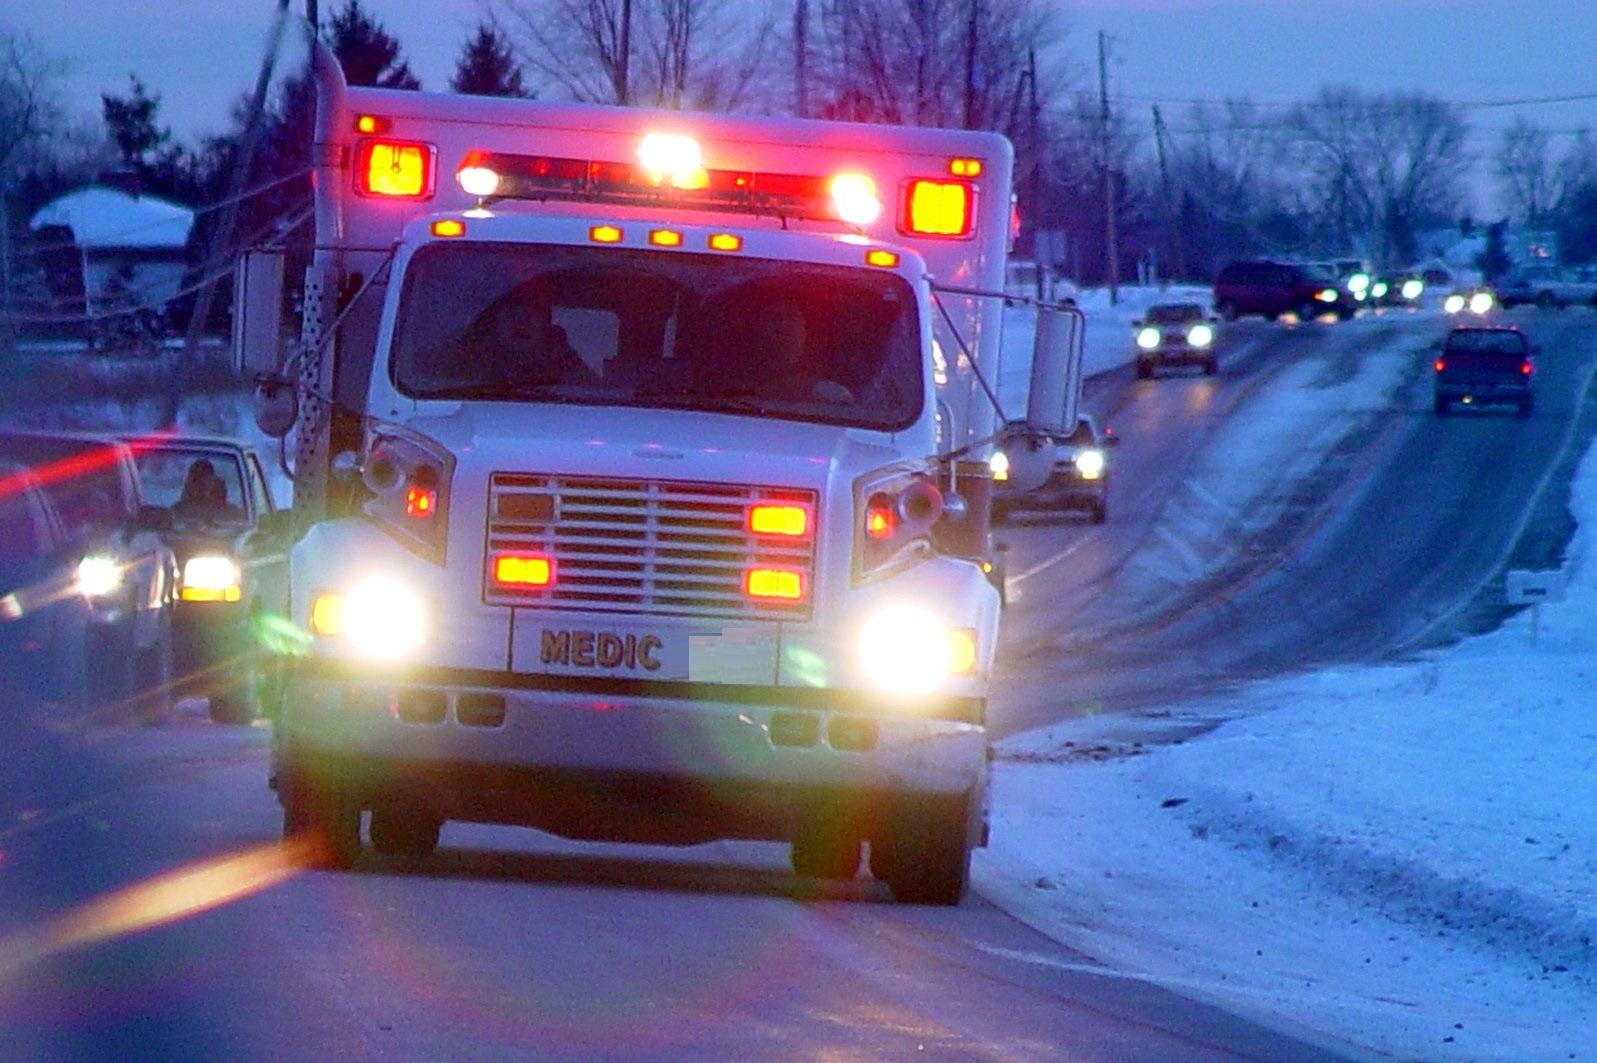 ambulance on road